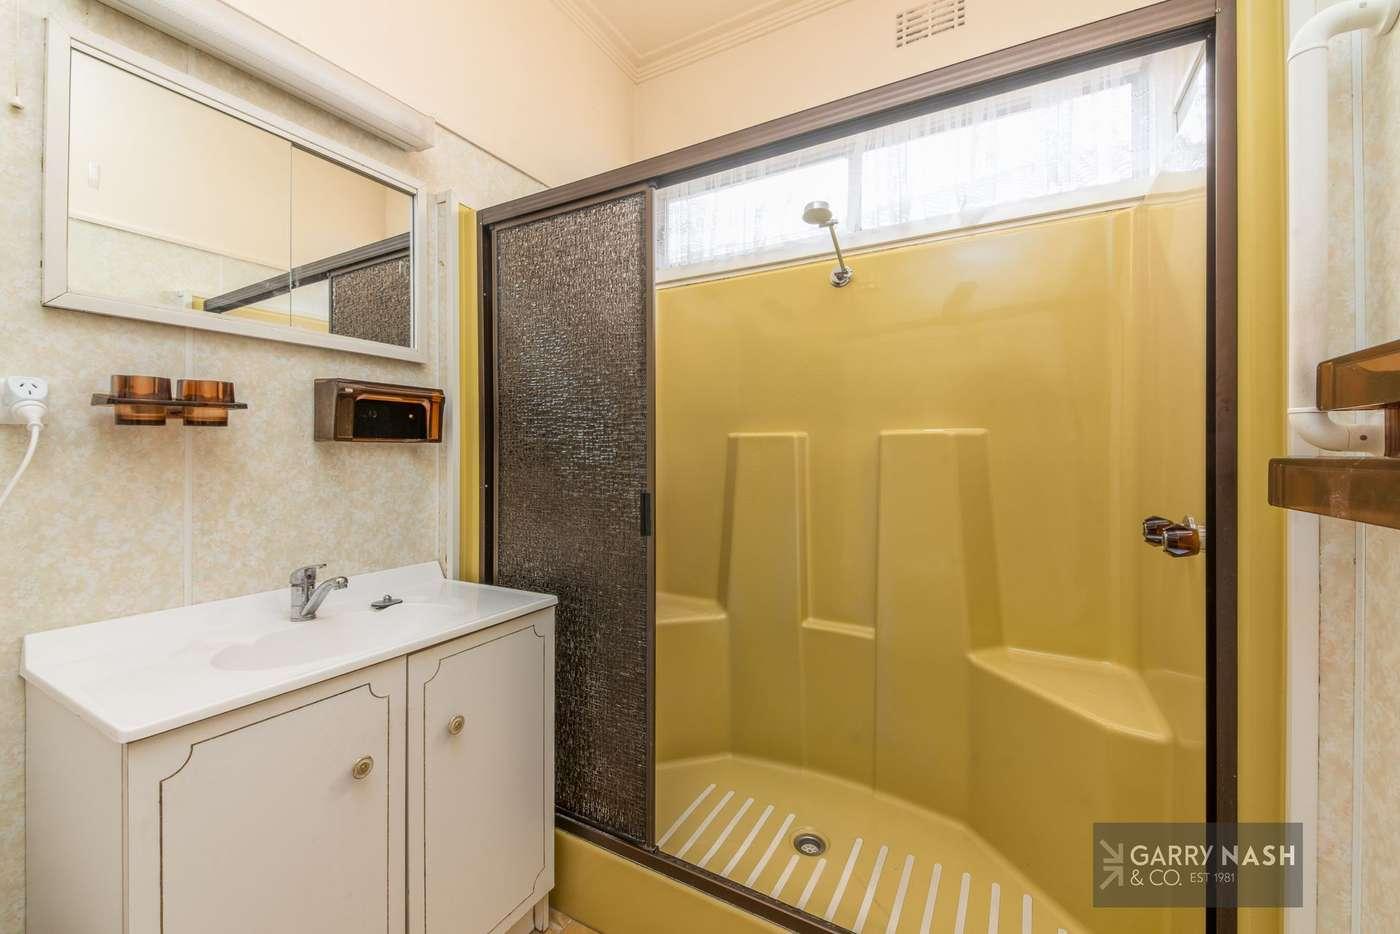 Sixth view of Homely house listing, 19 Larkings Street, Wangaratta VIC 3677